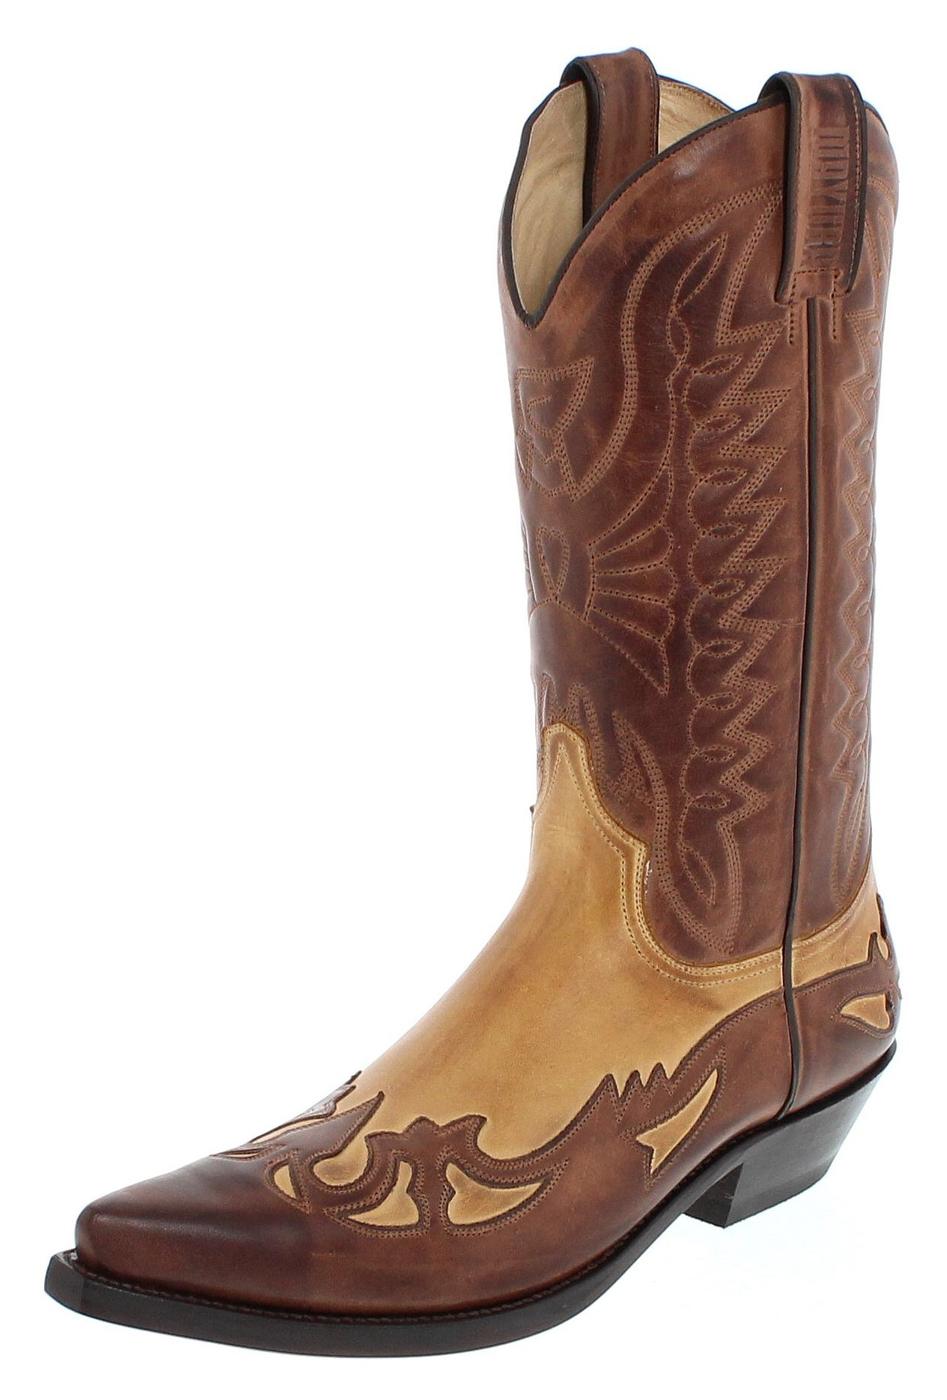 Mayura Boots 1933 Marron Western boot - brown